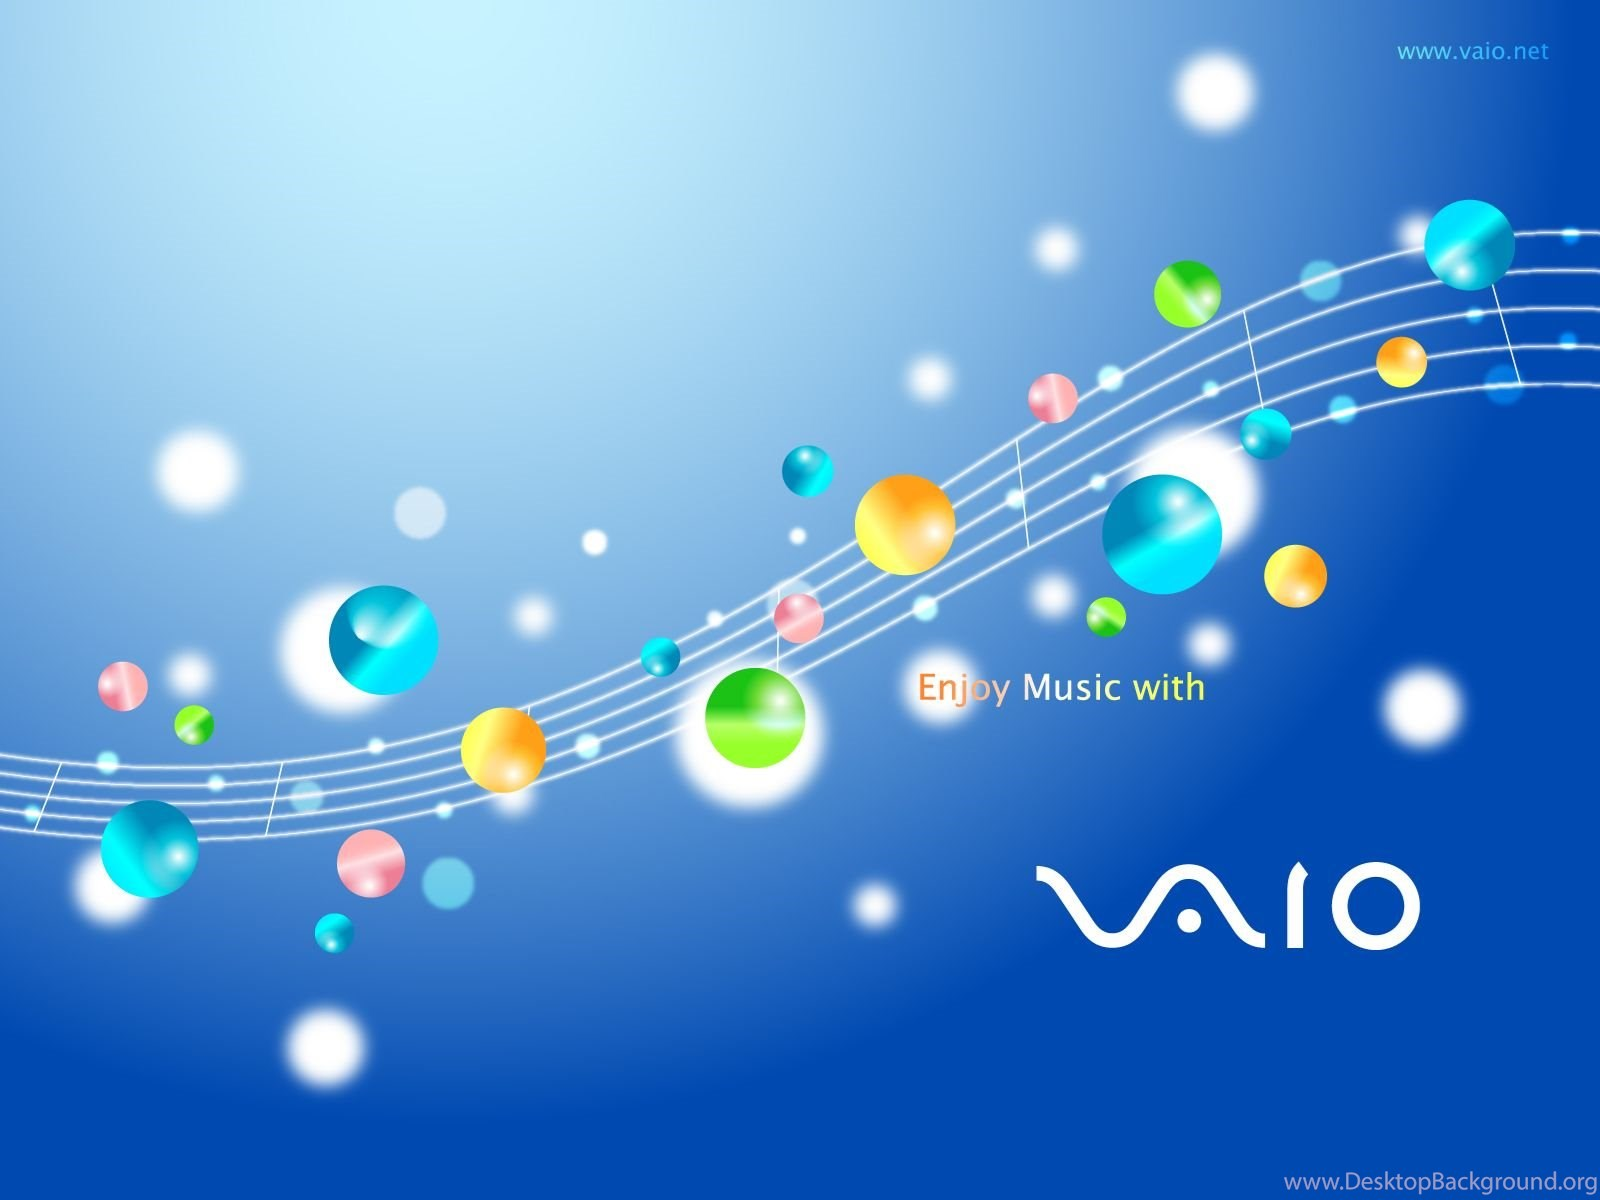 Vaio Wallpaper 1280x800: Sony Vaio Wallpapers HD Desktop Background